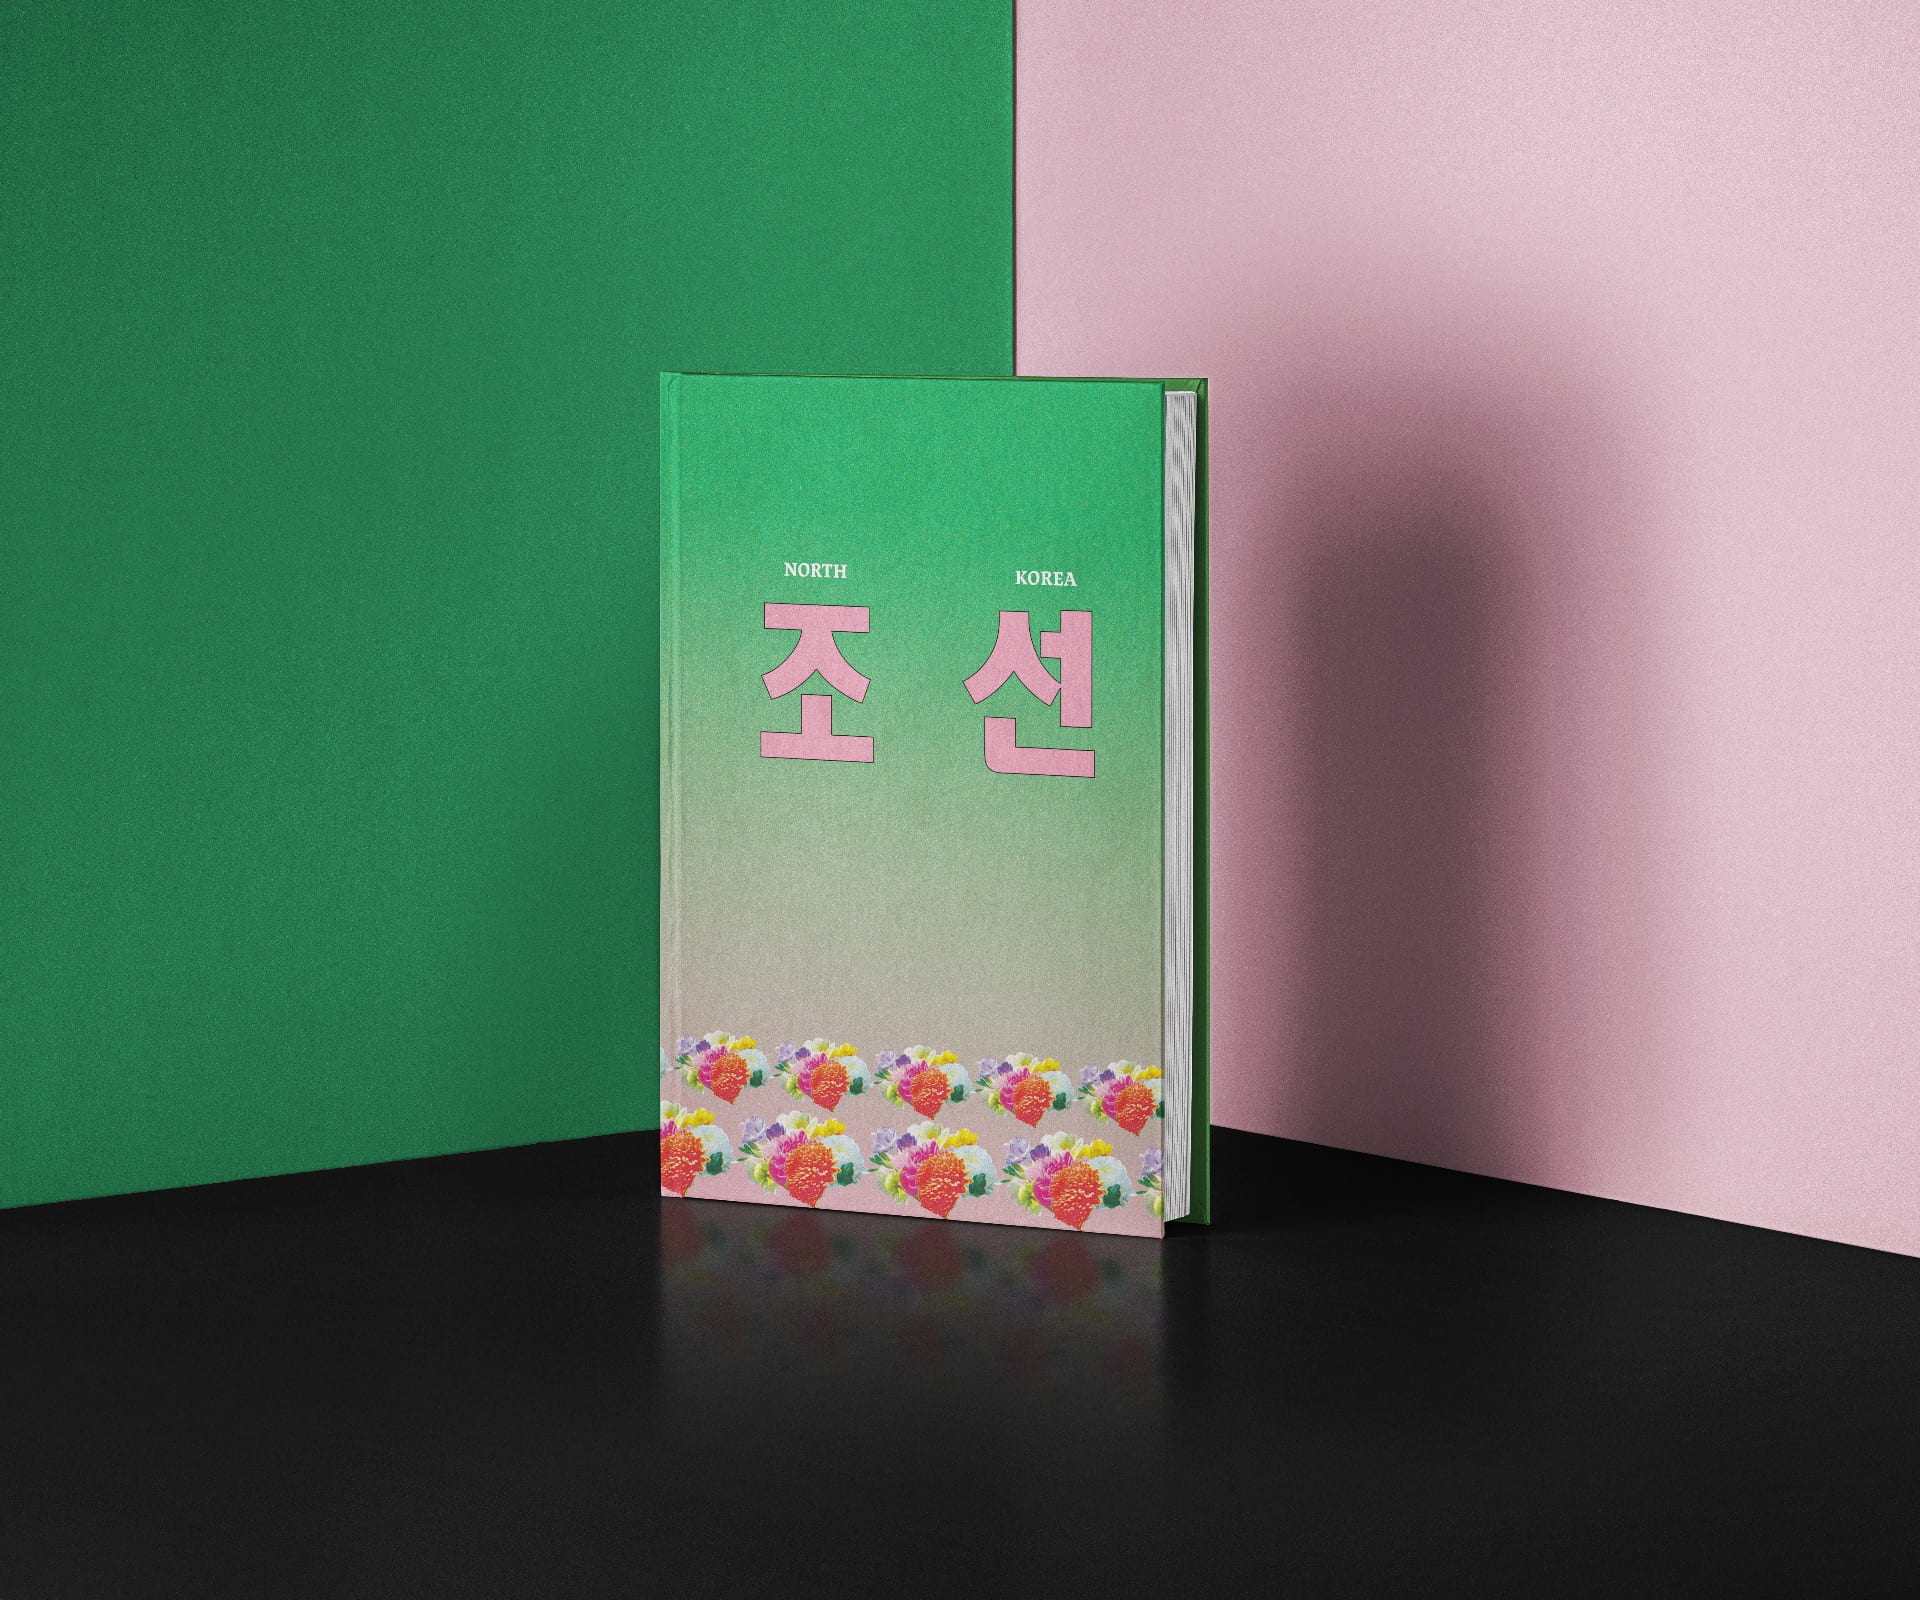 Core Studio Typography: Wikibook: North Korea